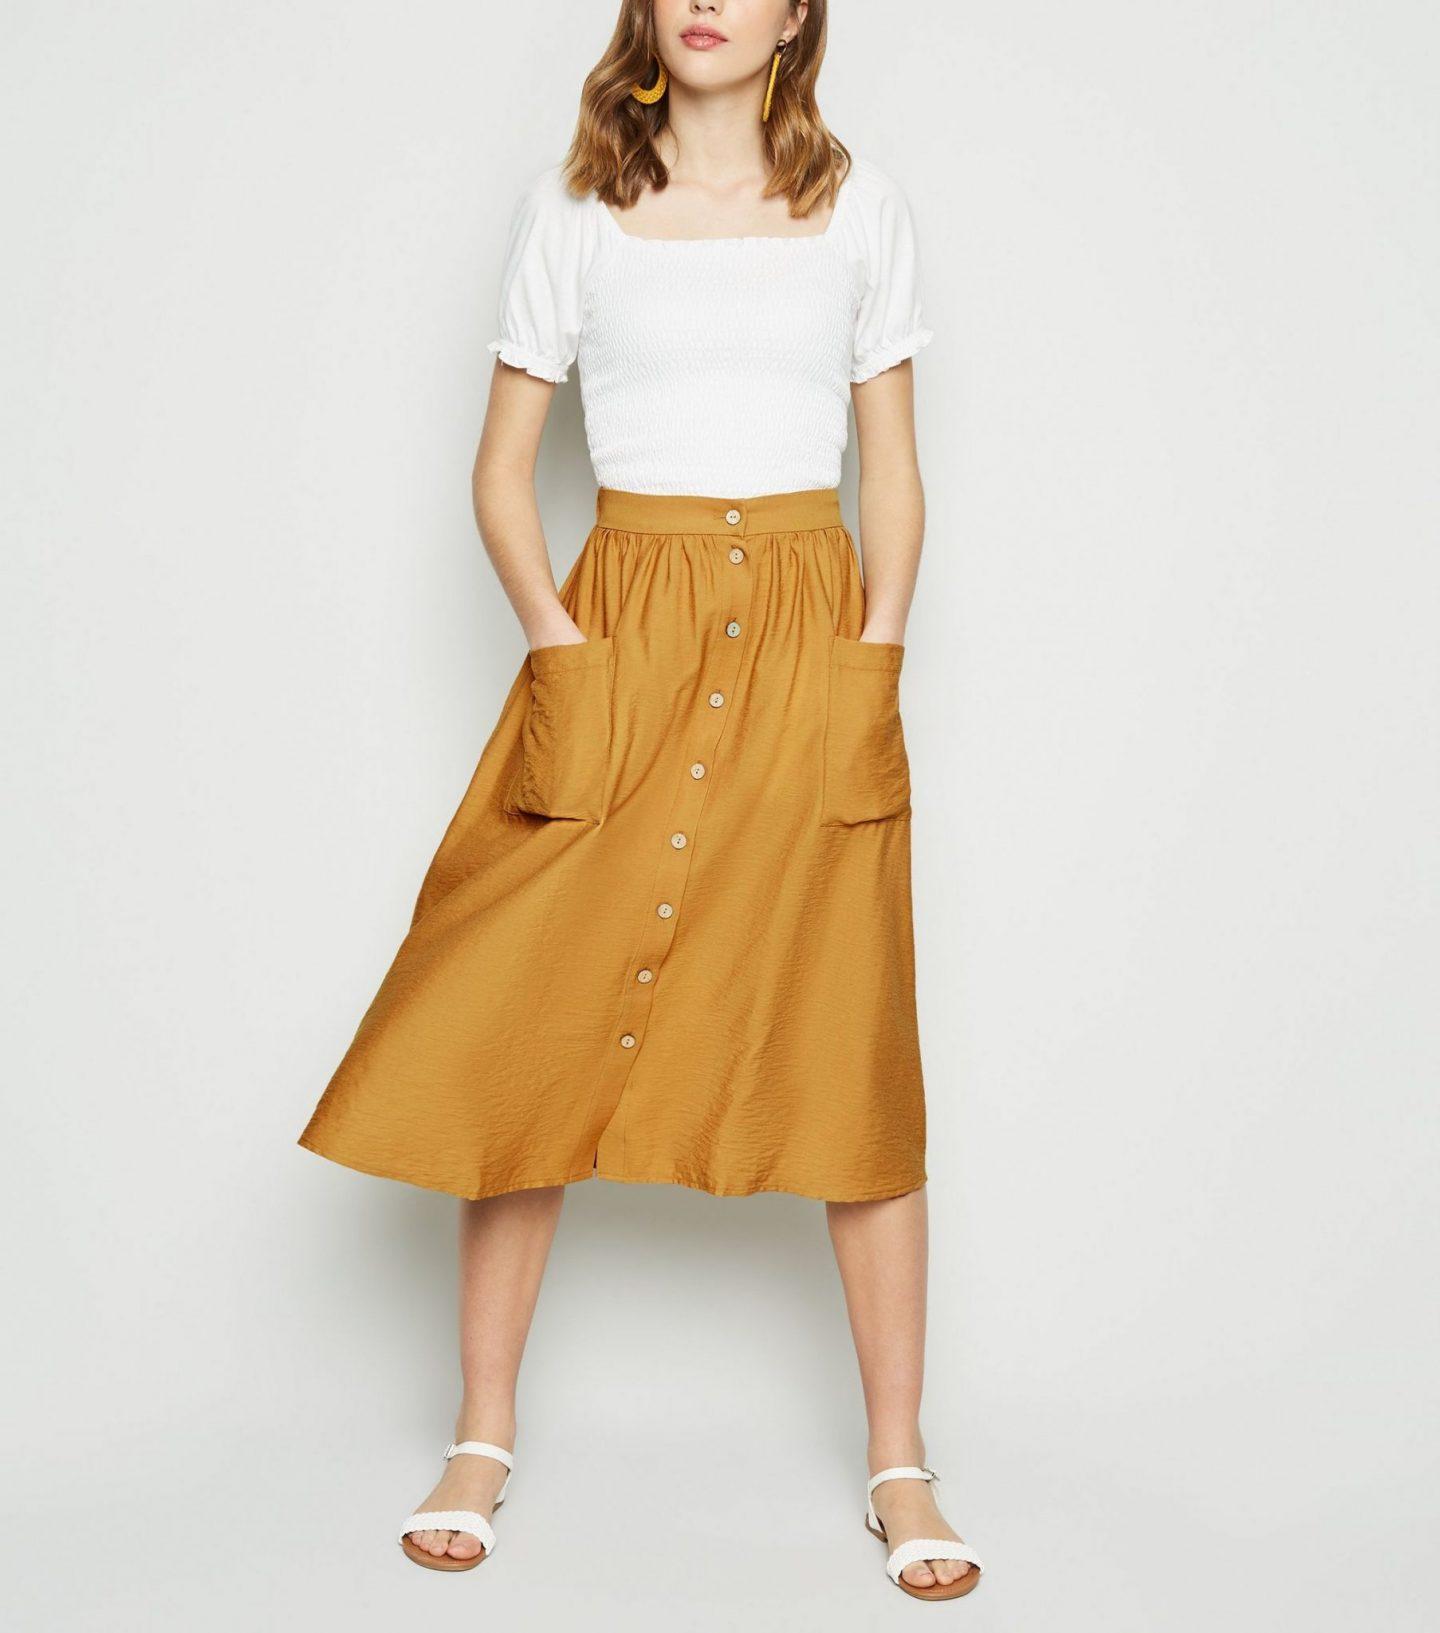 ca9af7b570 Denim Button Up Skirt New Look – DACC